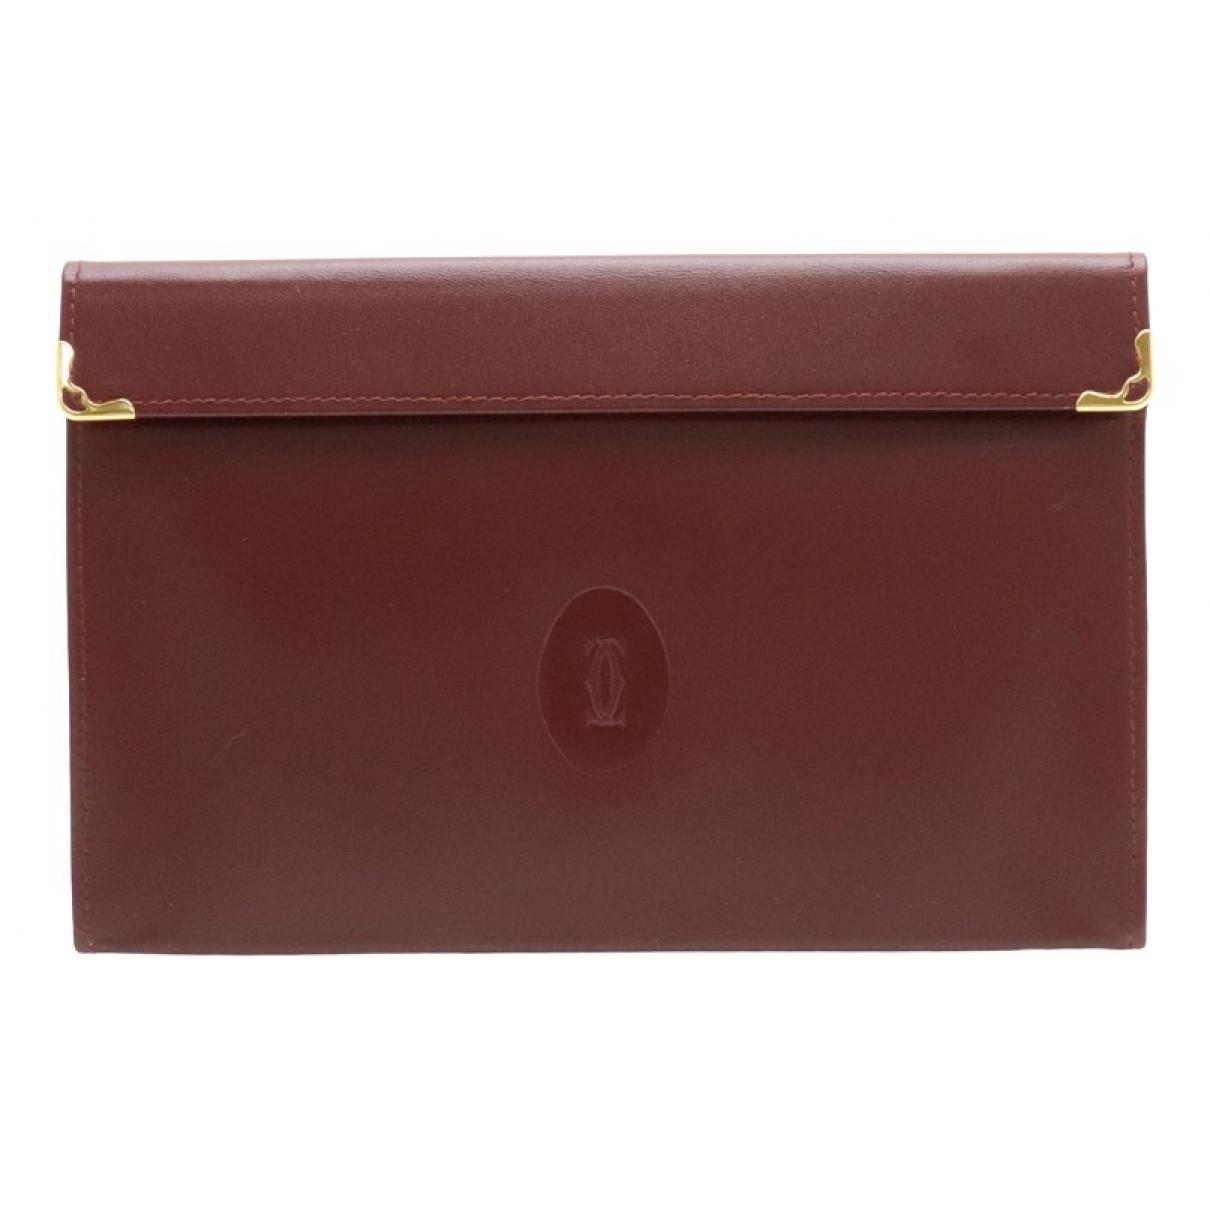 Cartier \N Burgundy Leather Clutch bag for Women \N